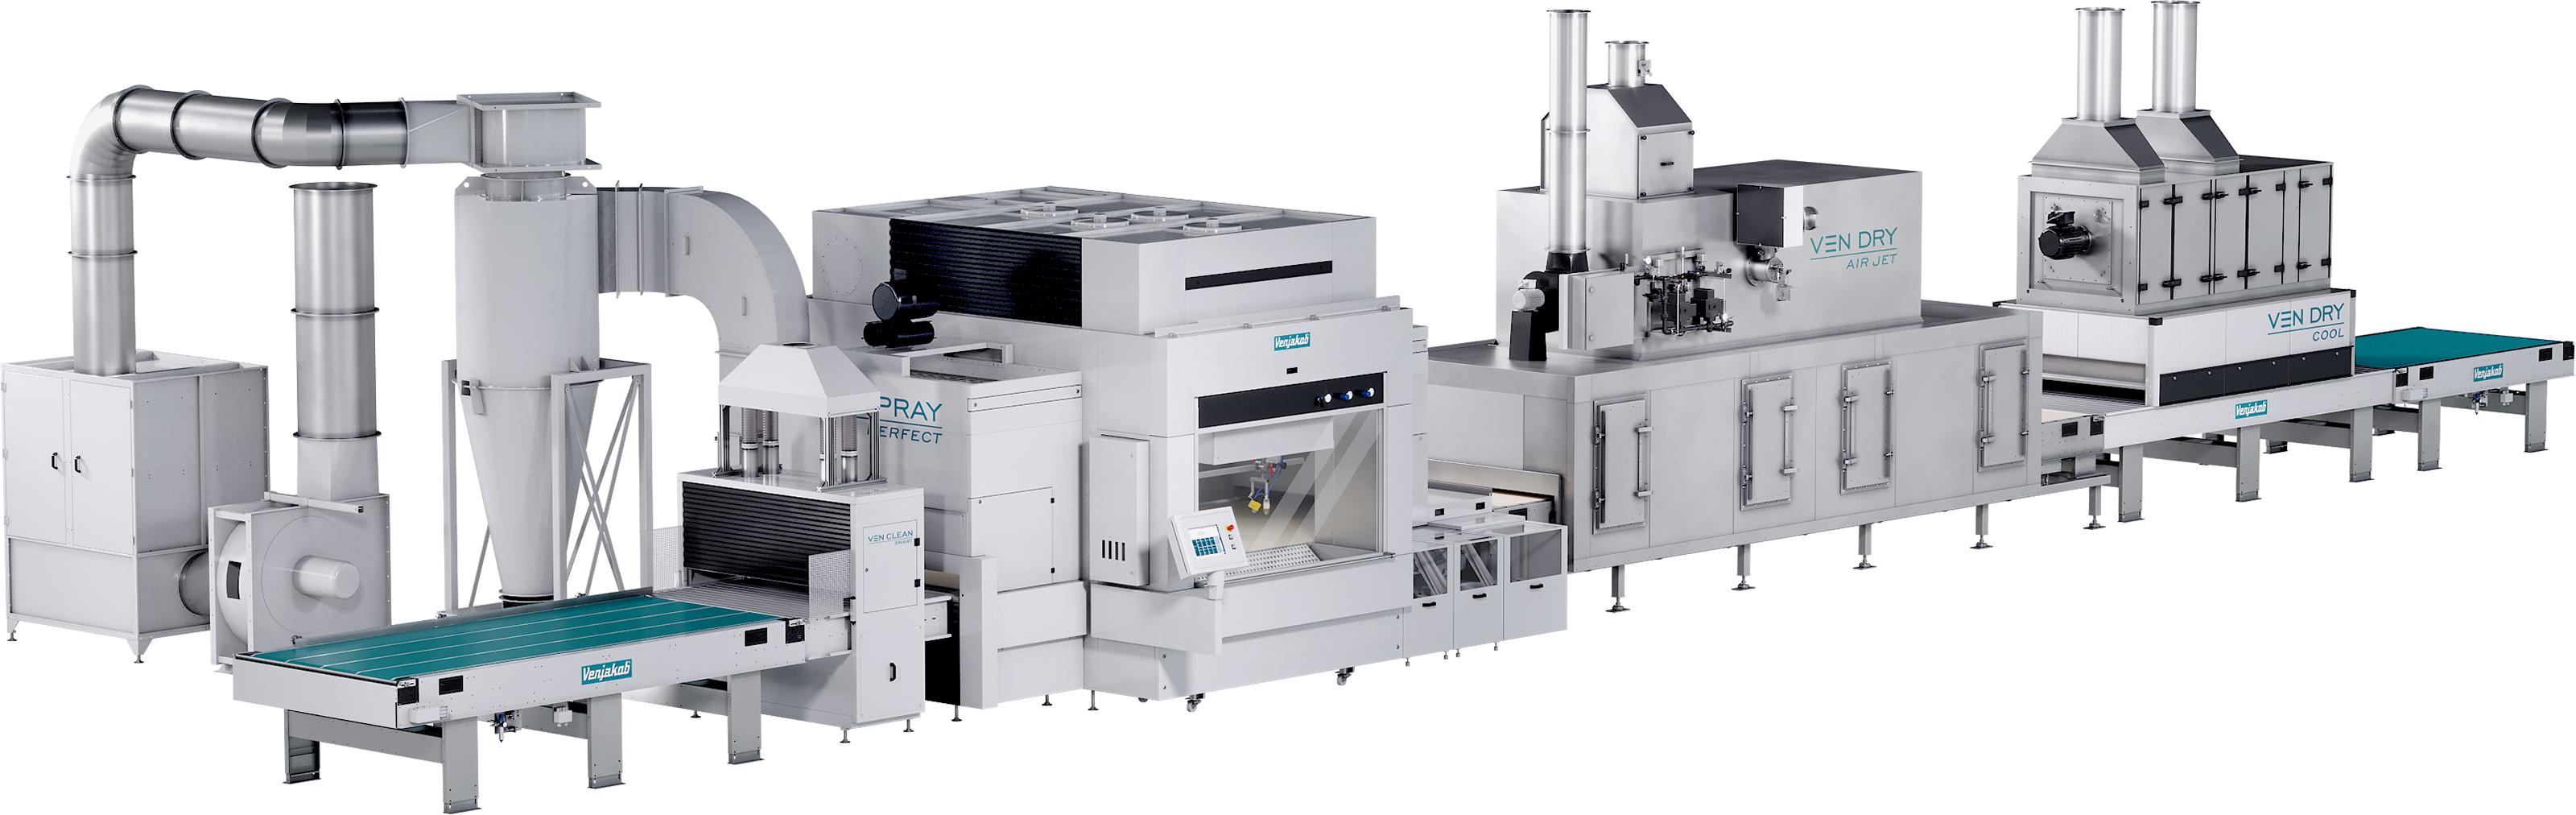 Picture coating machine insulating materials